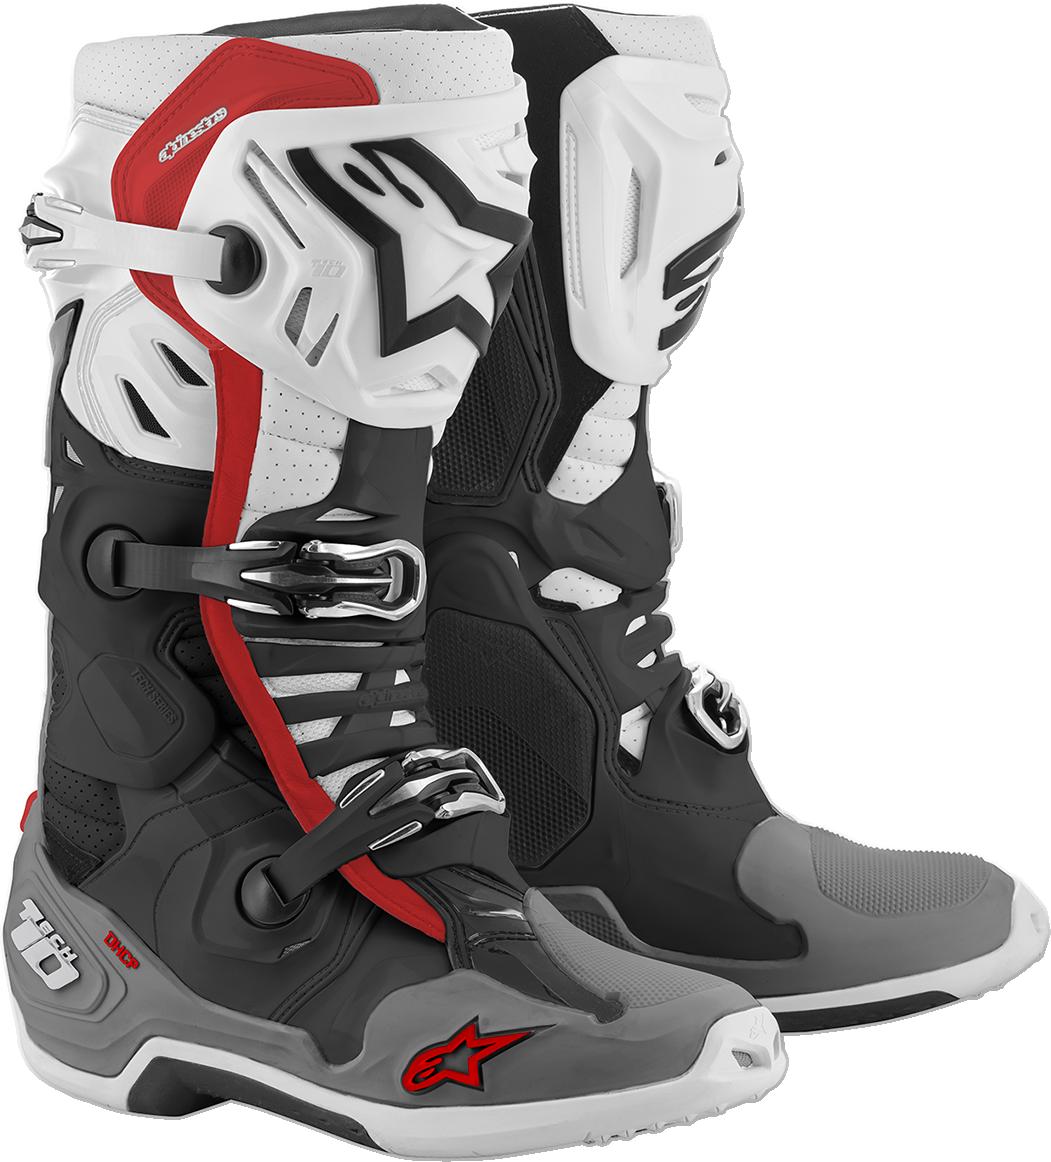 Alpinestars Tech 10 Supervented Mens Offroad Riding Dirt Bike MX Racing Boots